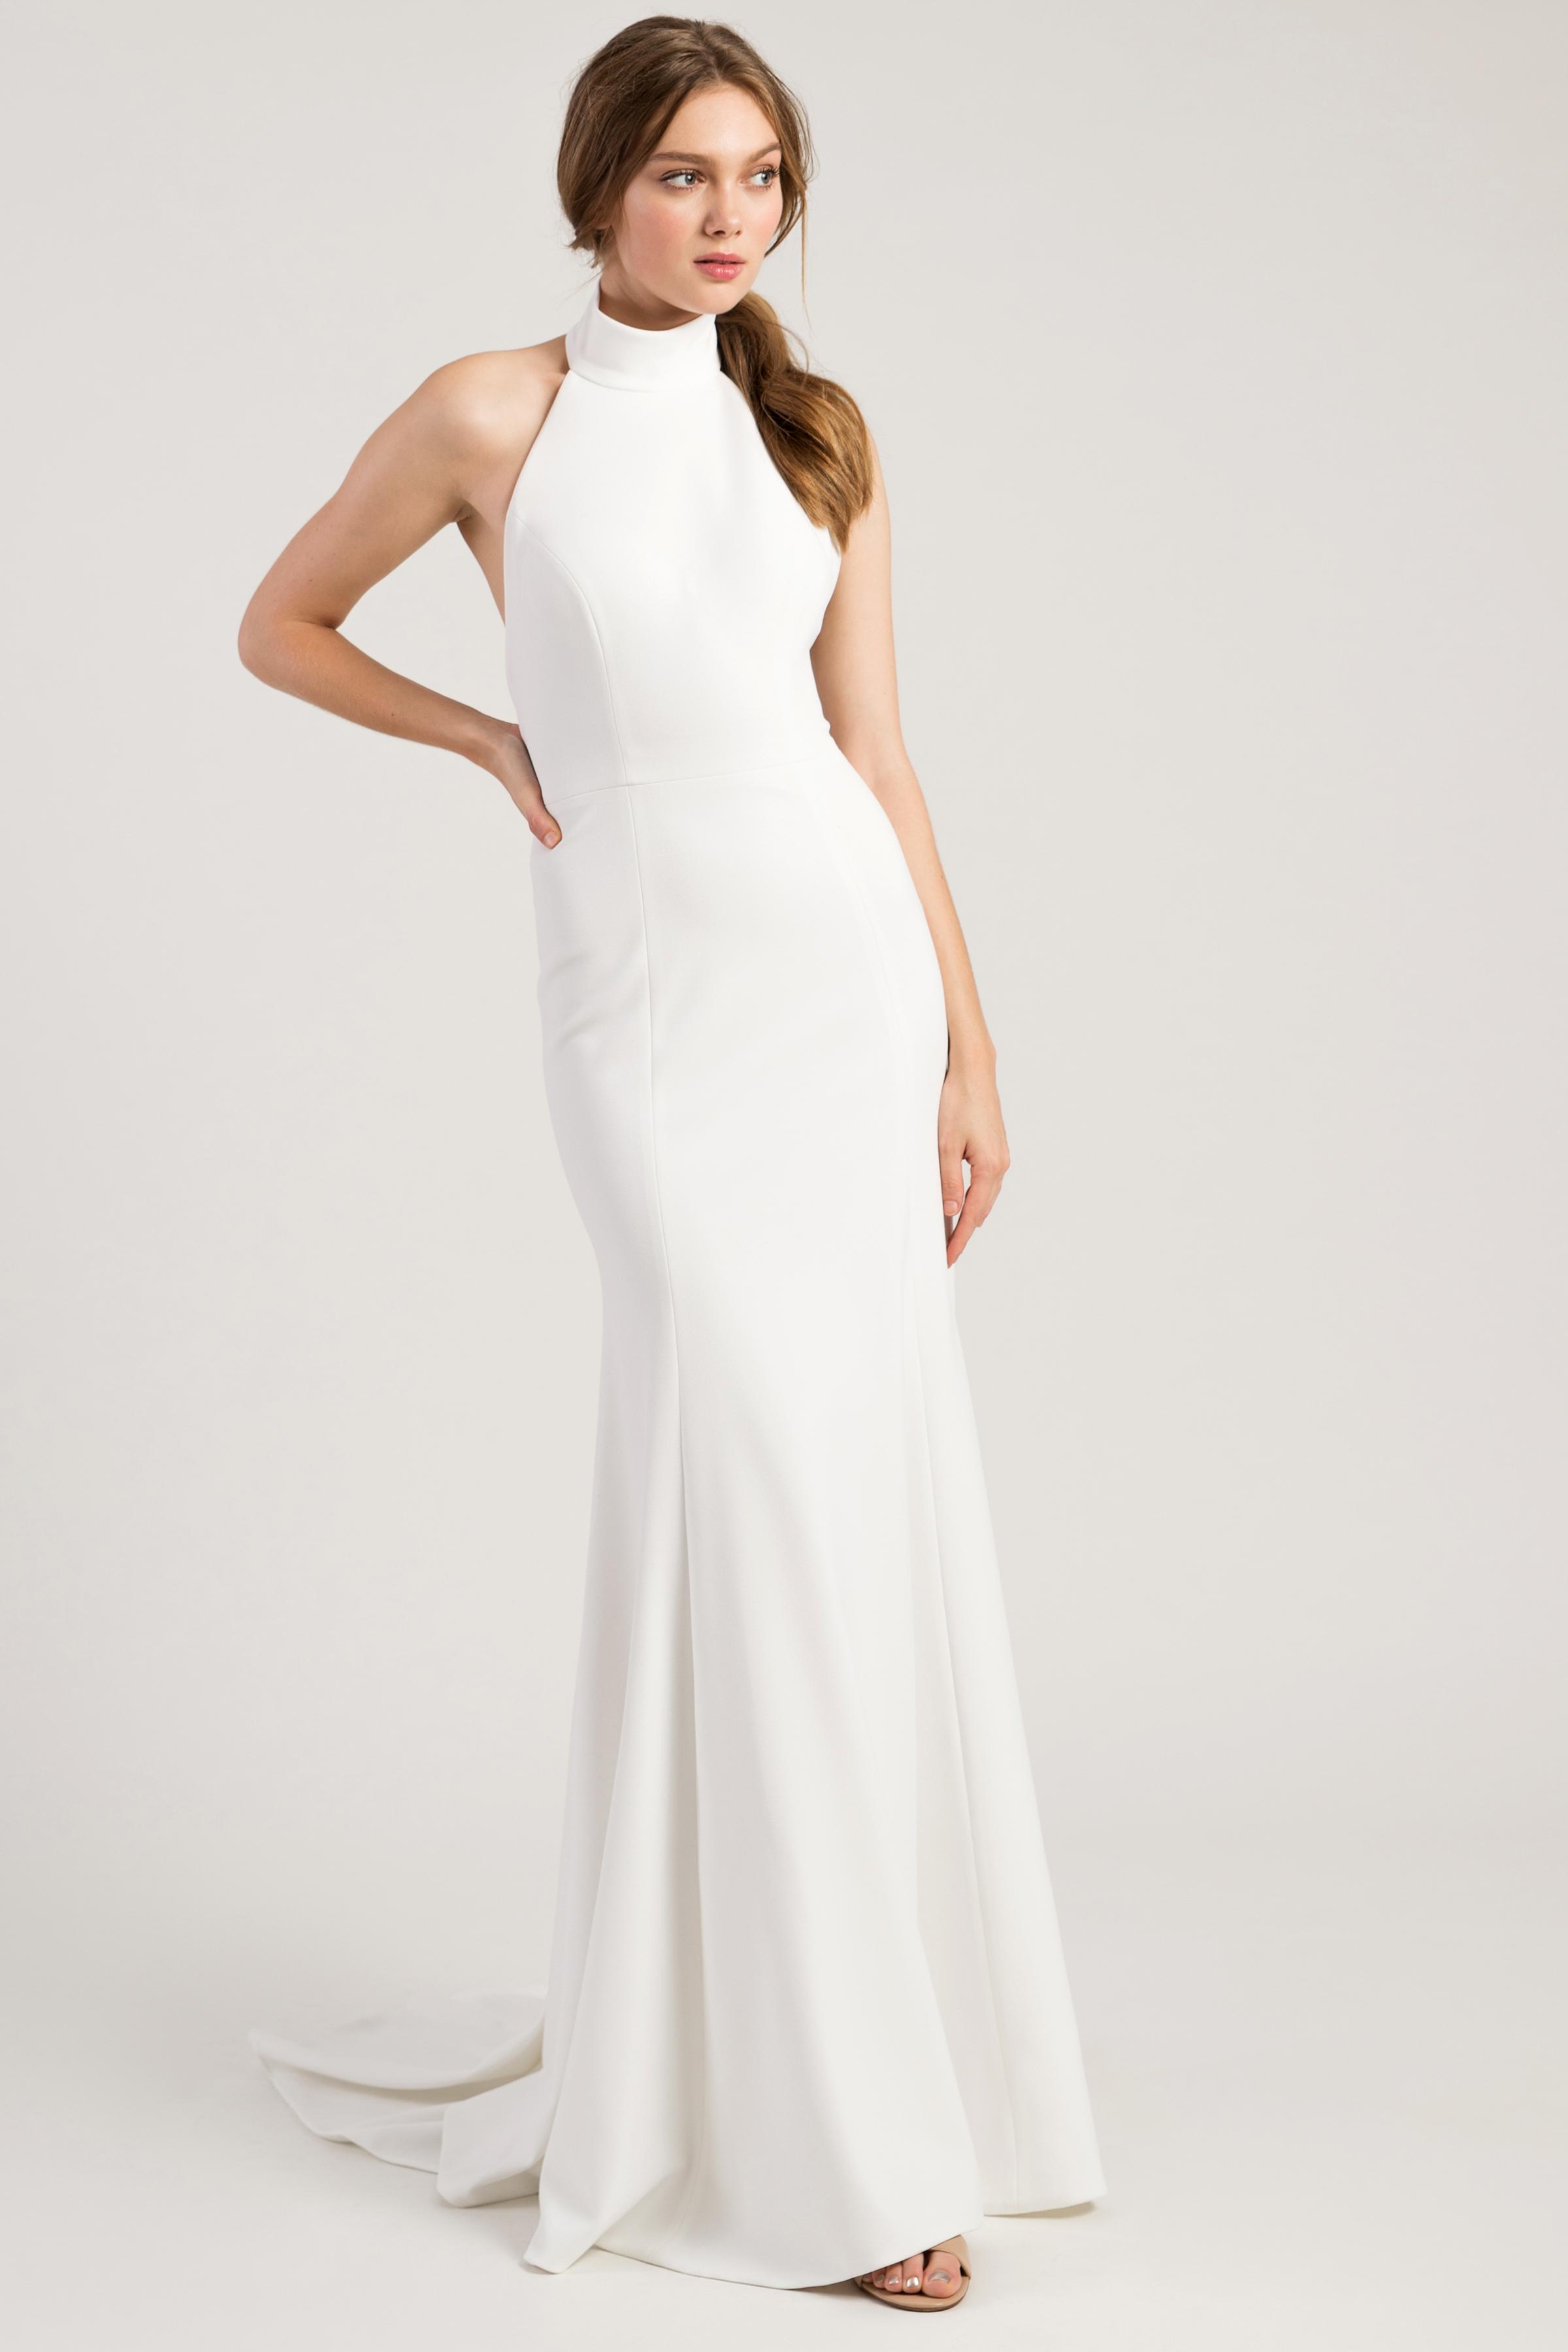 jenny by jenny yoo wedding dress high neck sleeveless trumpet